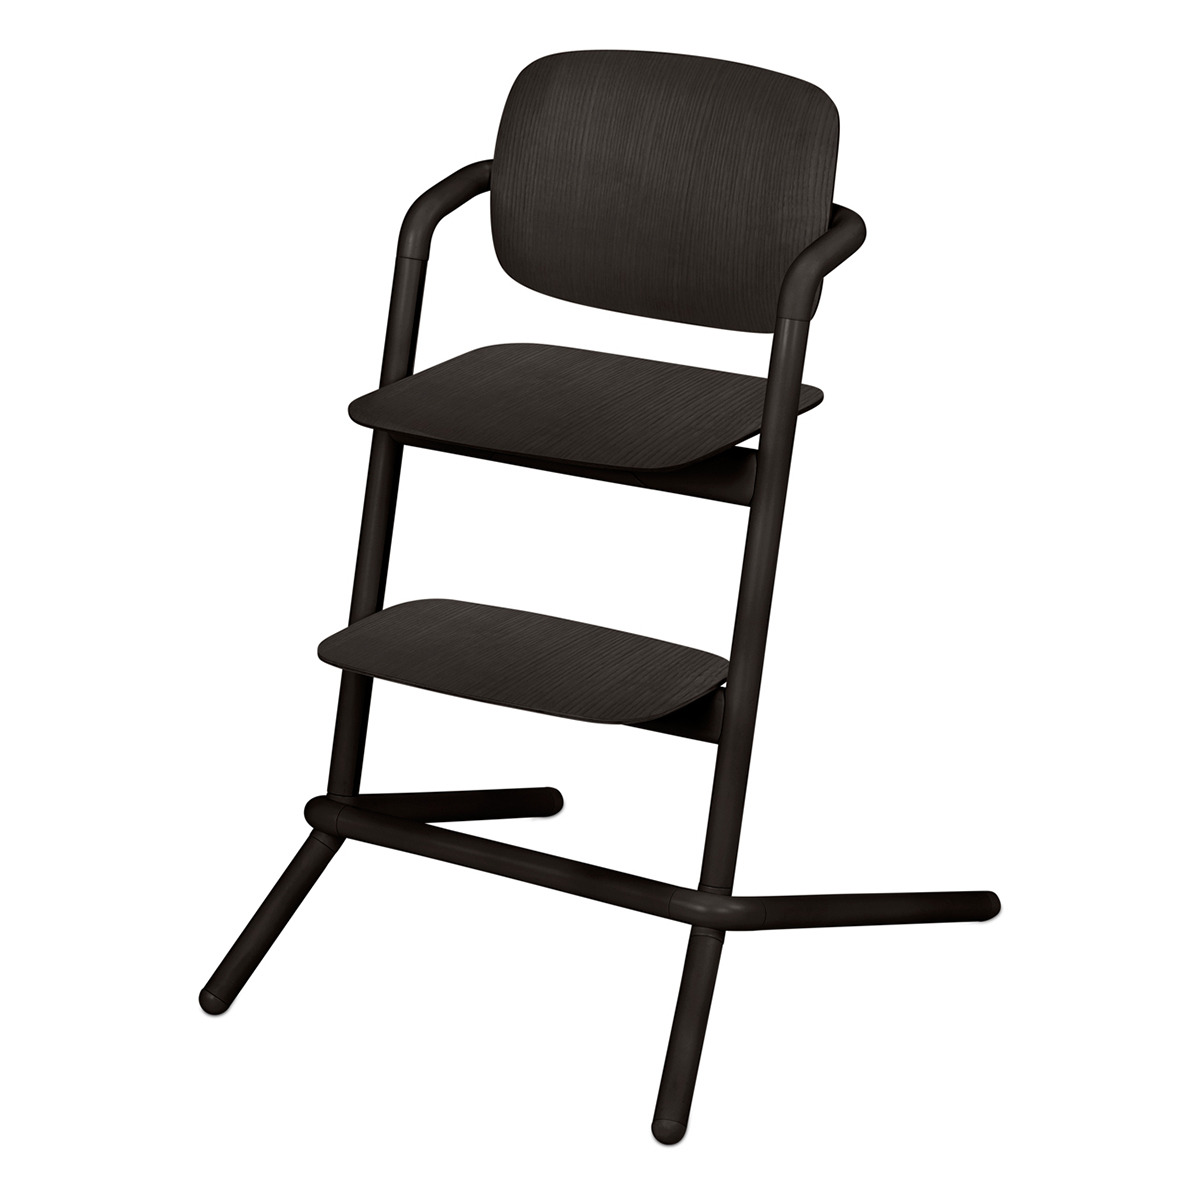 Chaise haute Chaise Haute Lemo Bois - Infinity Black